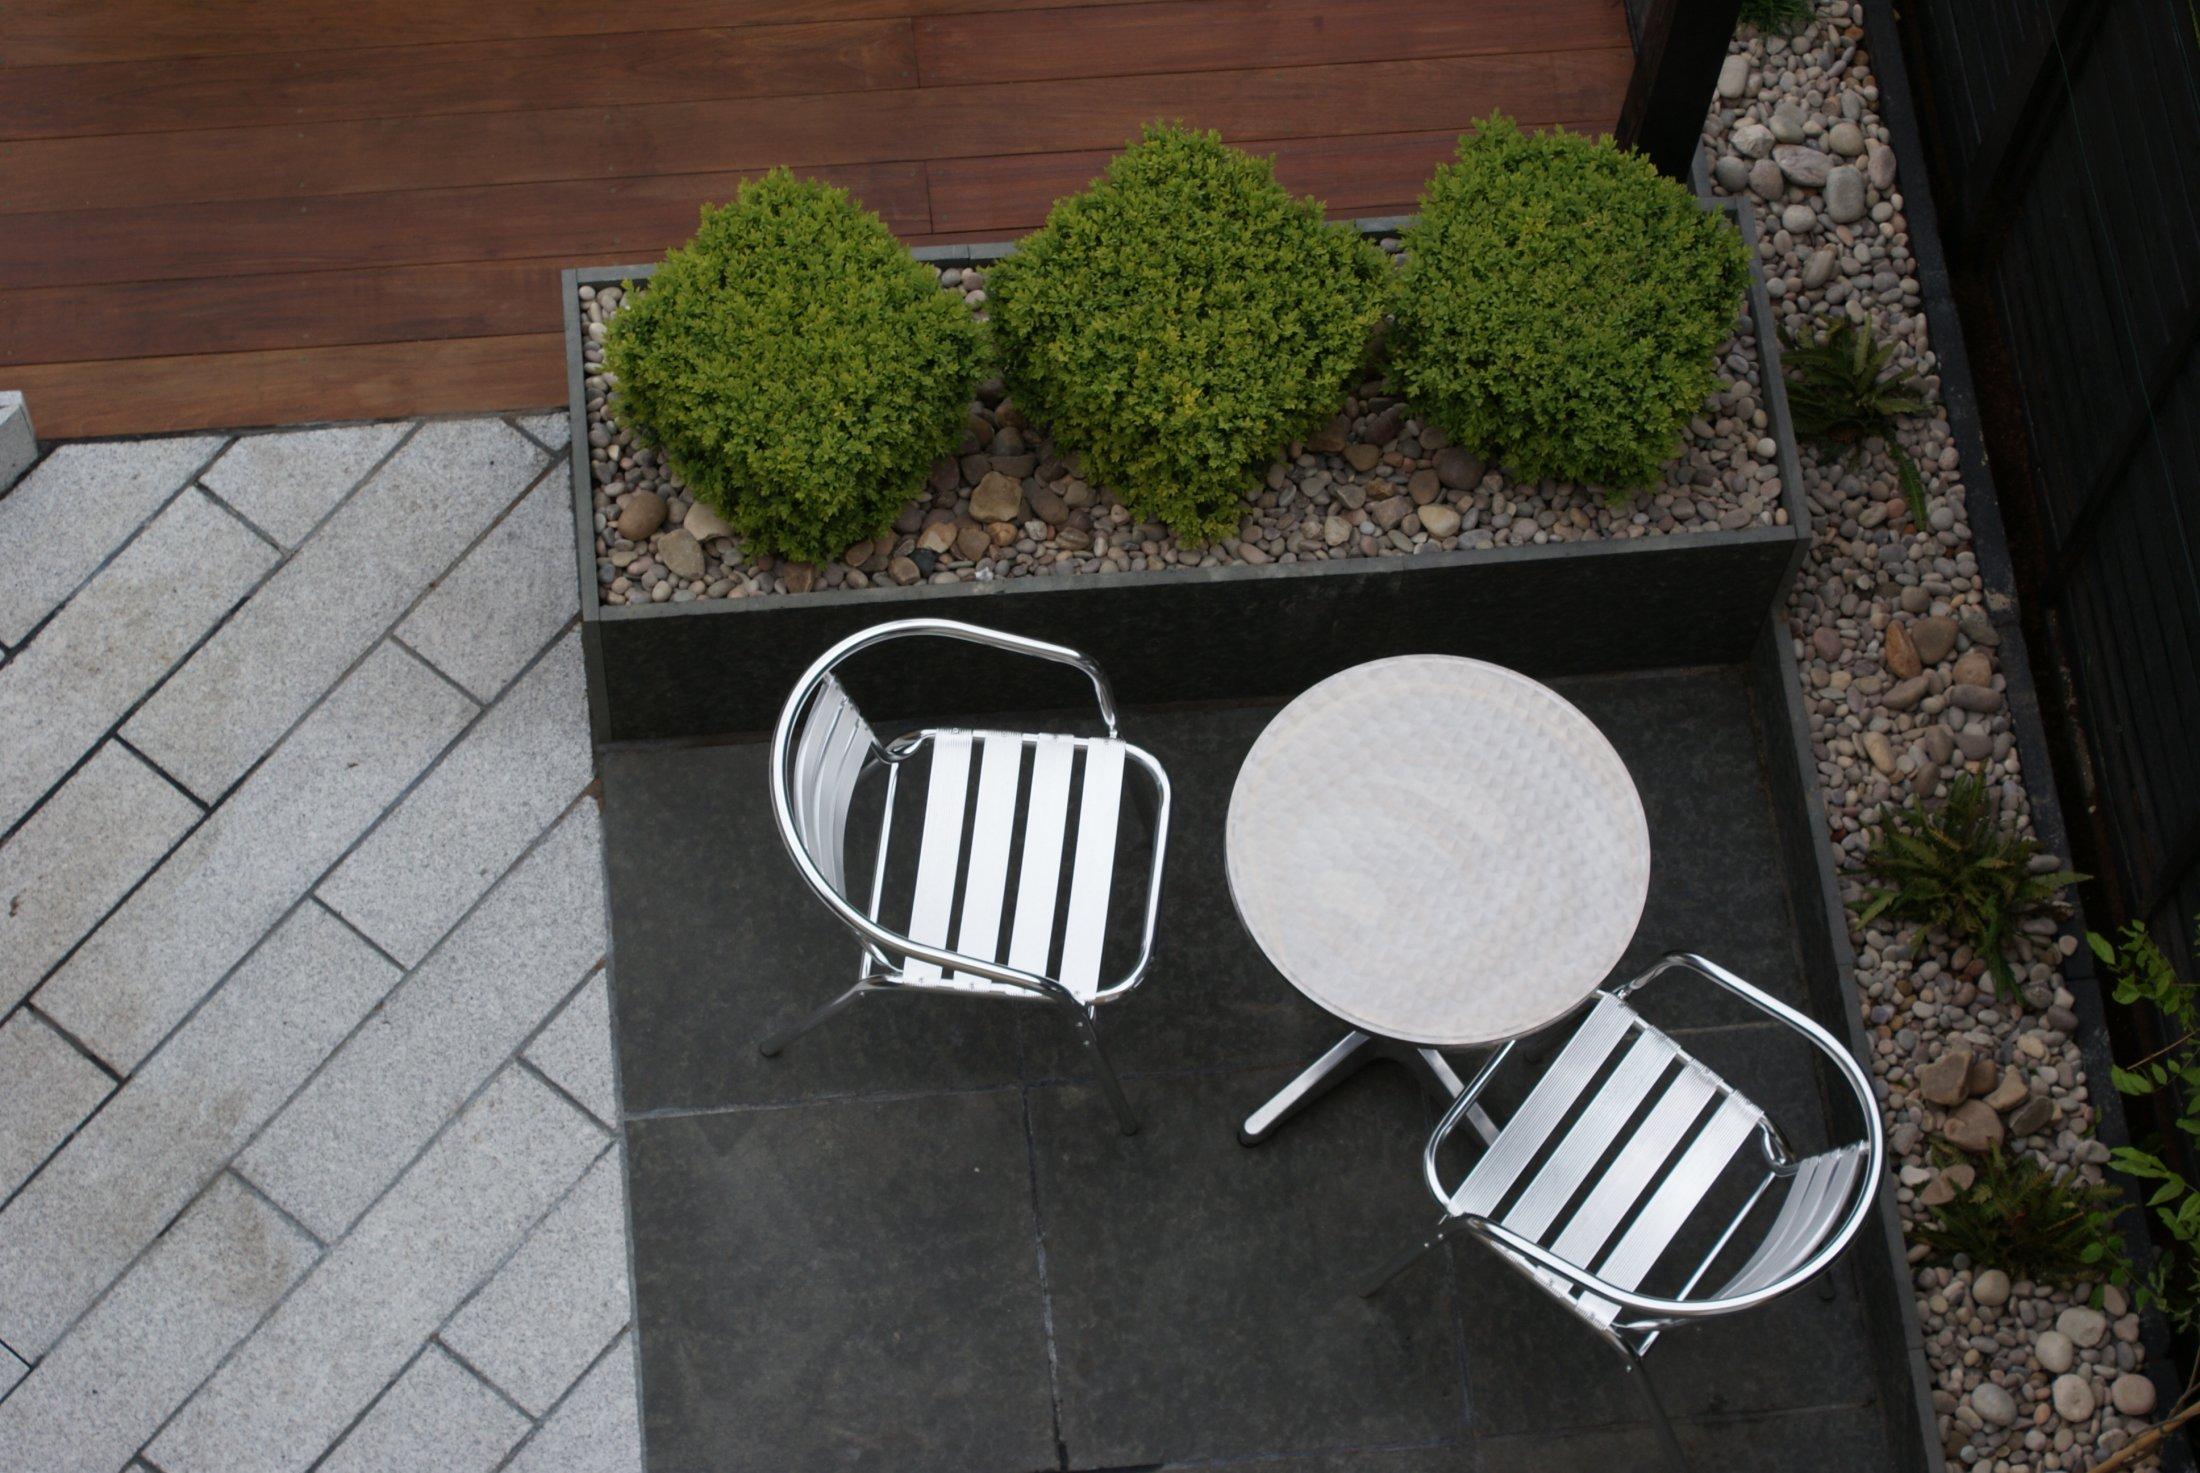 Contemporary garden design in hardwood and granite